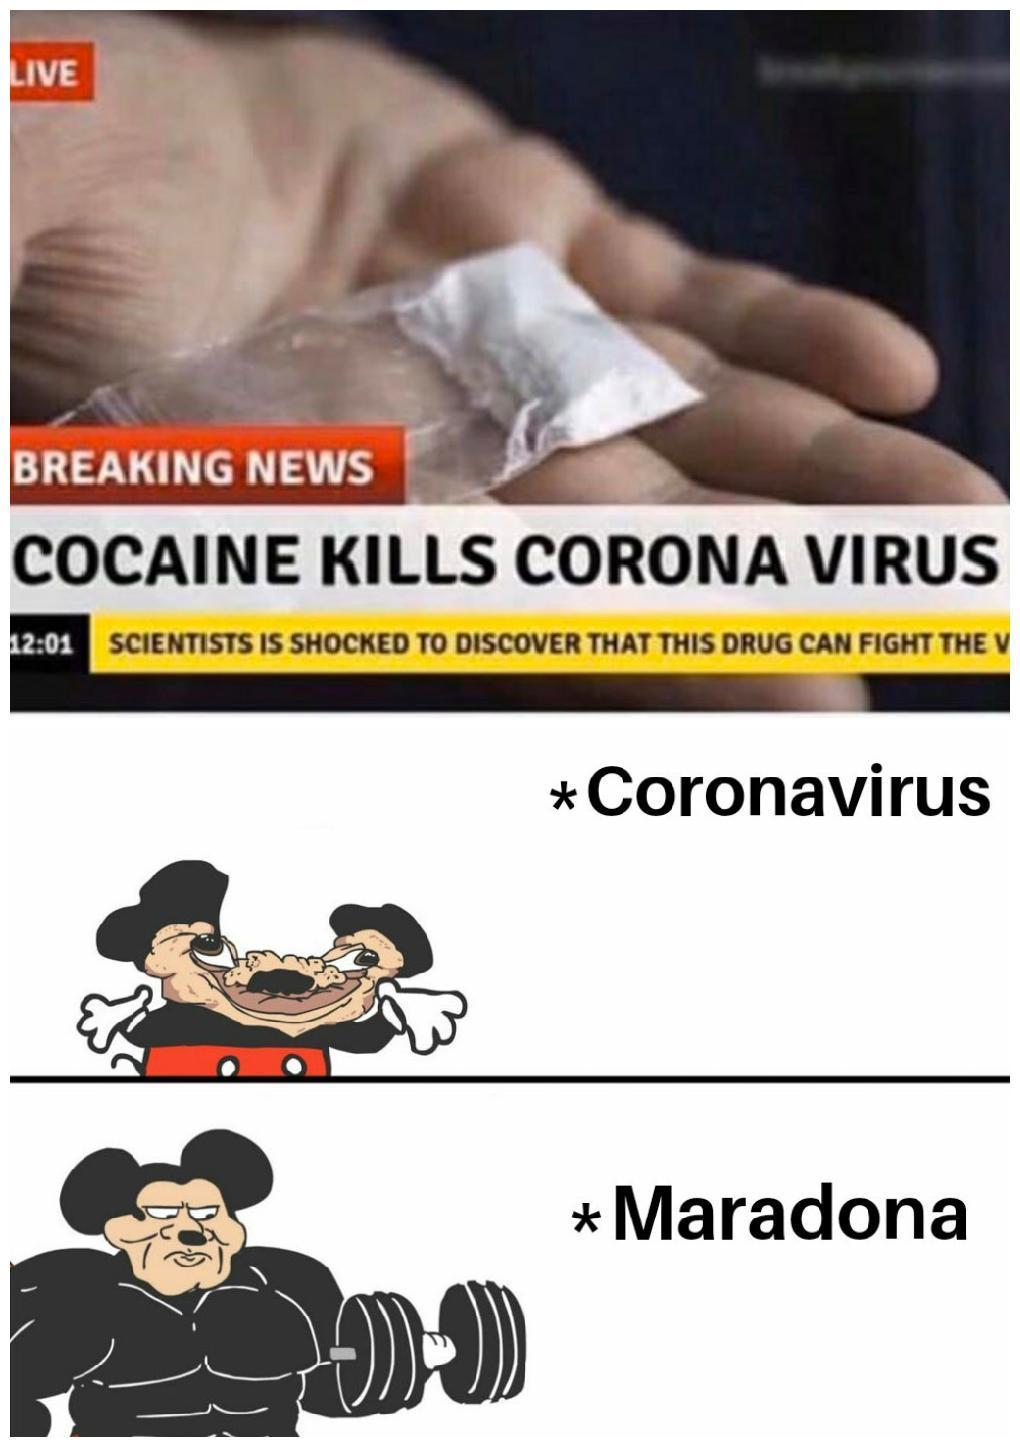 Maradona le rompe el ogt al Coronavirus - meme